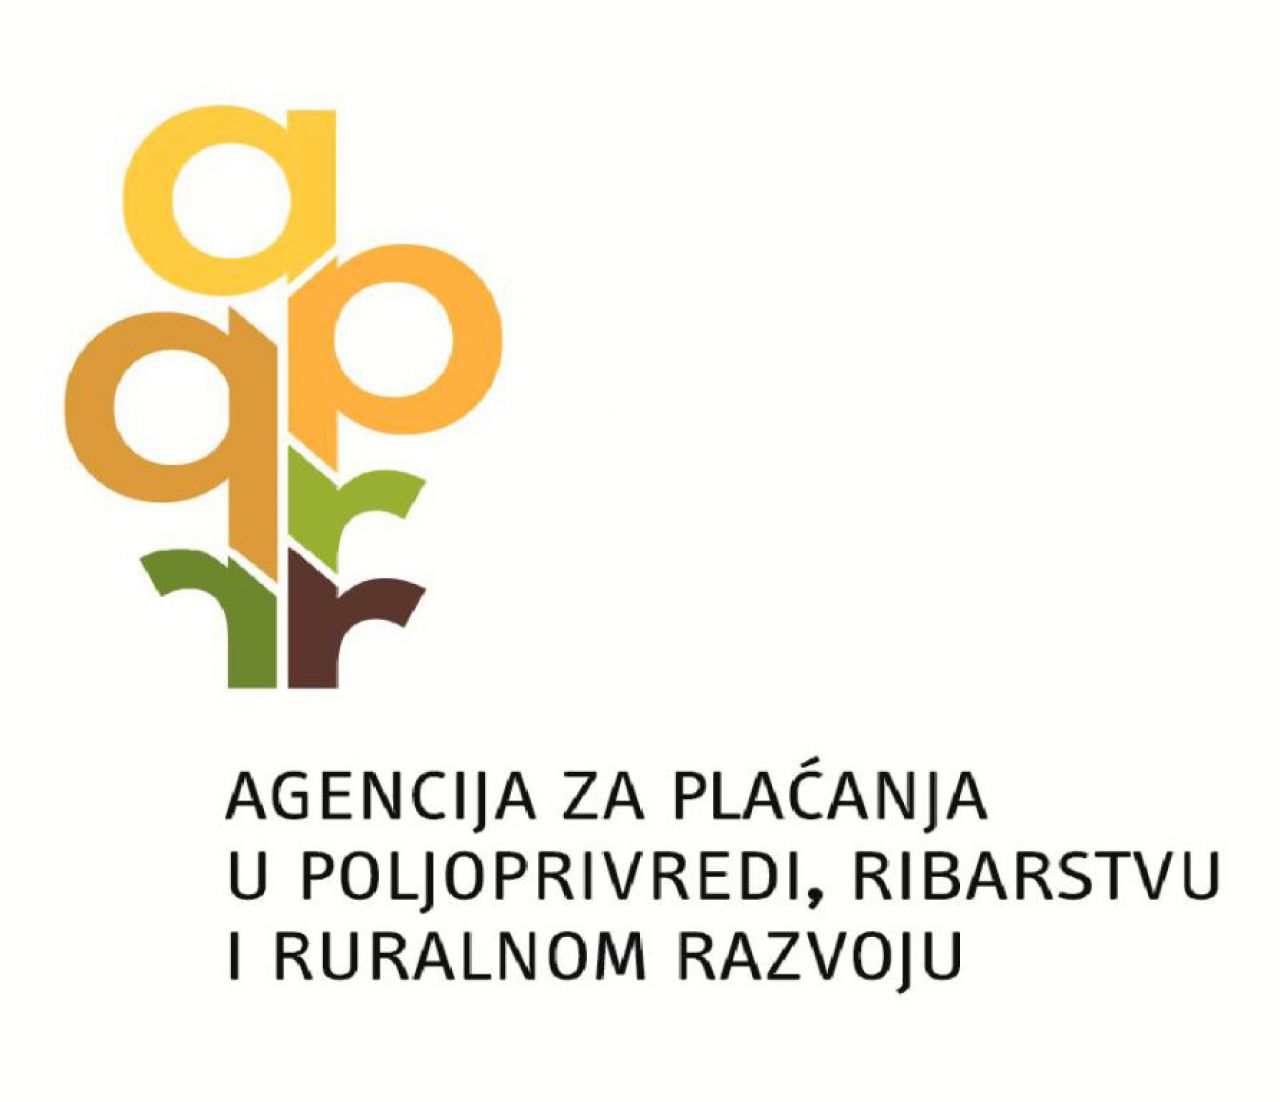 Lag-ovima s područja Splitsko-dalmatinske županije, Adrion, Zagora, Škoji, Brač i Cetinska krajina odobreno 42.252.163,80 kuna za poljoprivredu I ruralni razvoj